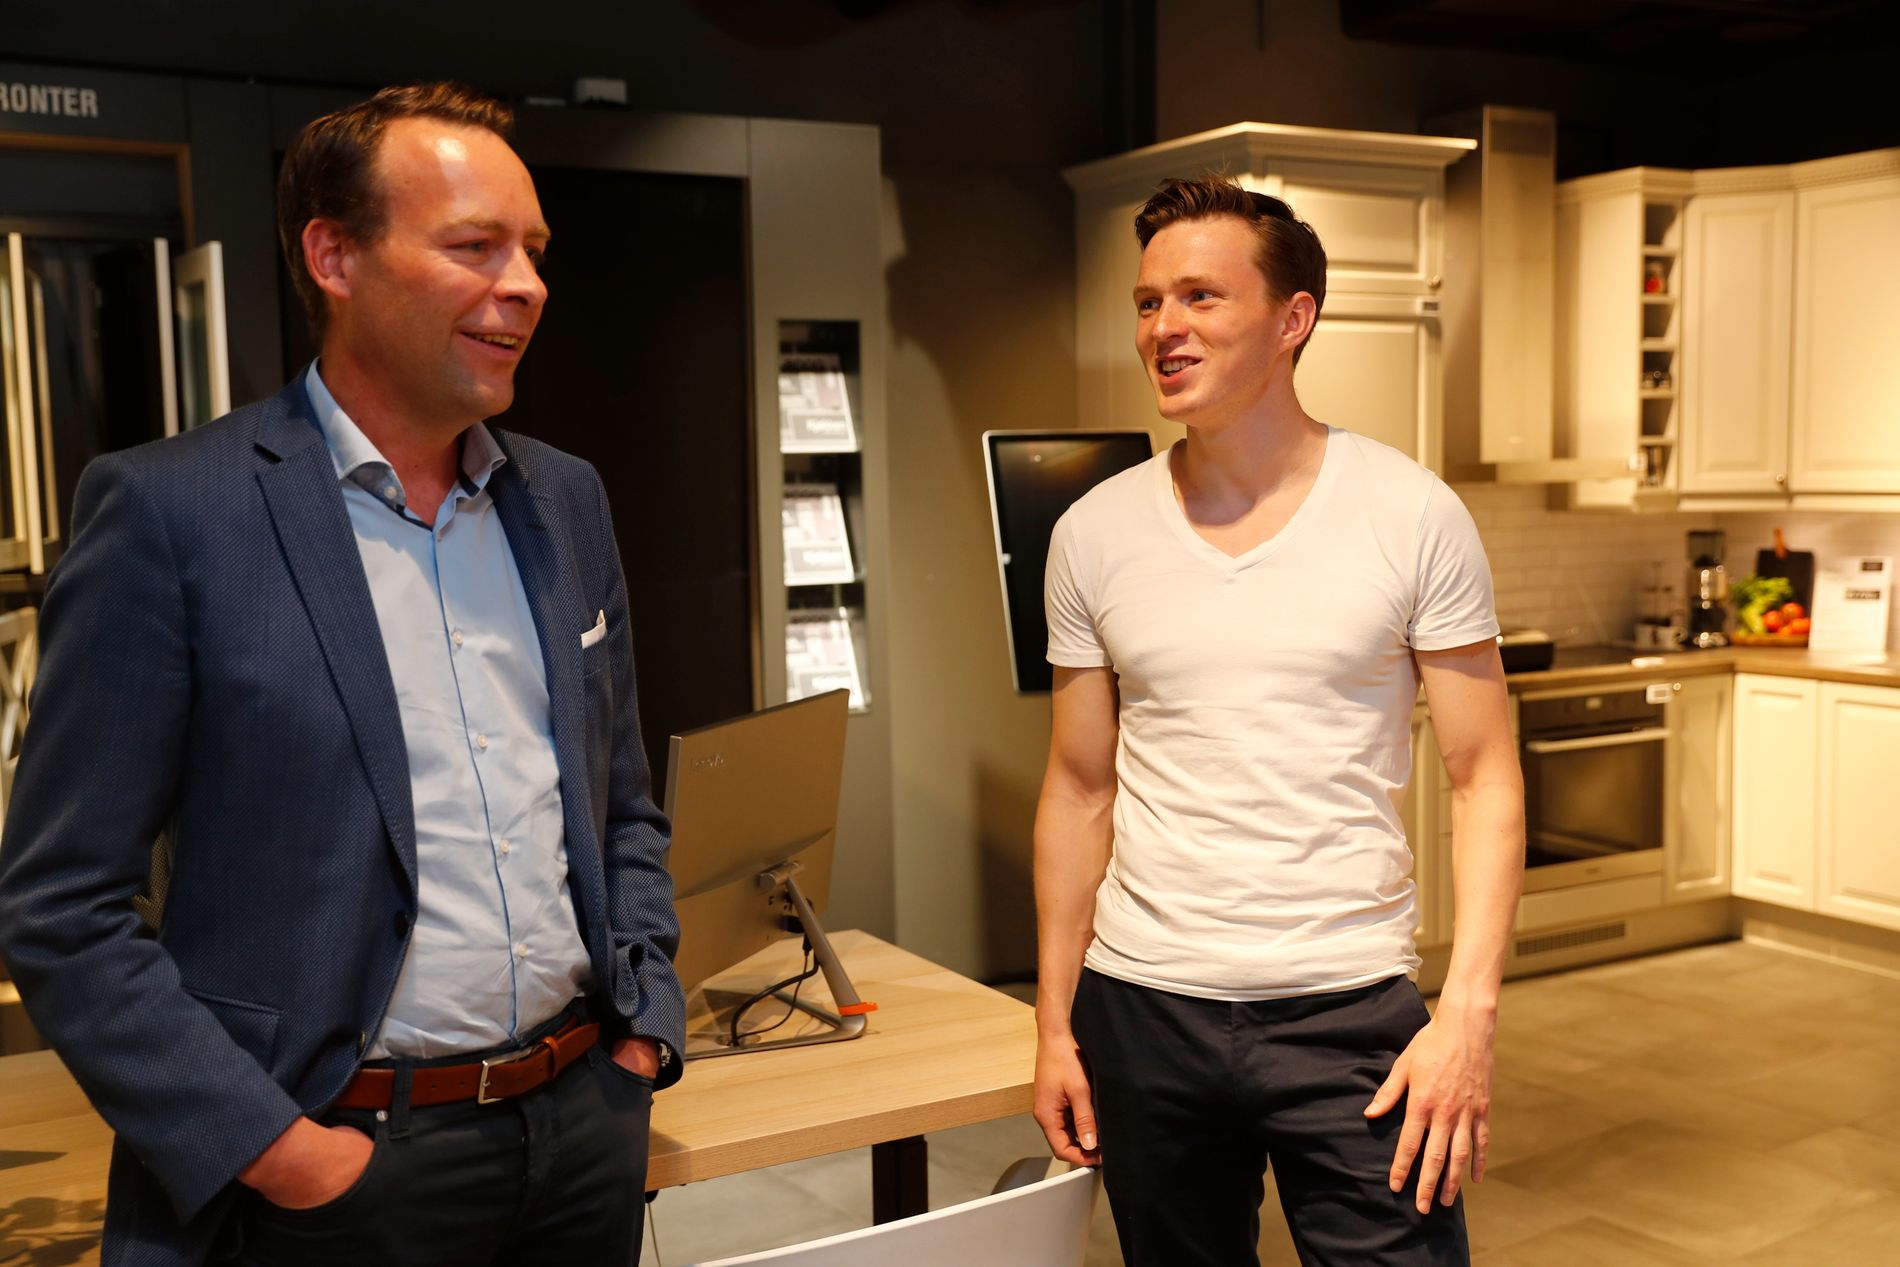 AVTALE: Karsten Warholm sammen med Elkjøp-sjef Jaan Ivar Semlitsch.